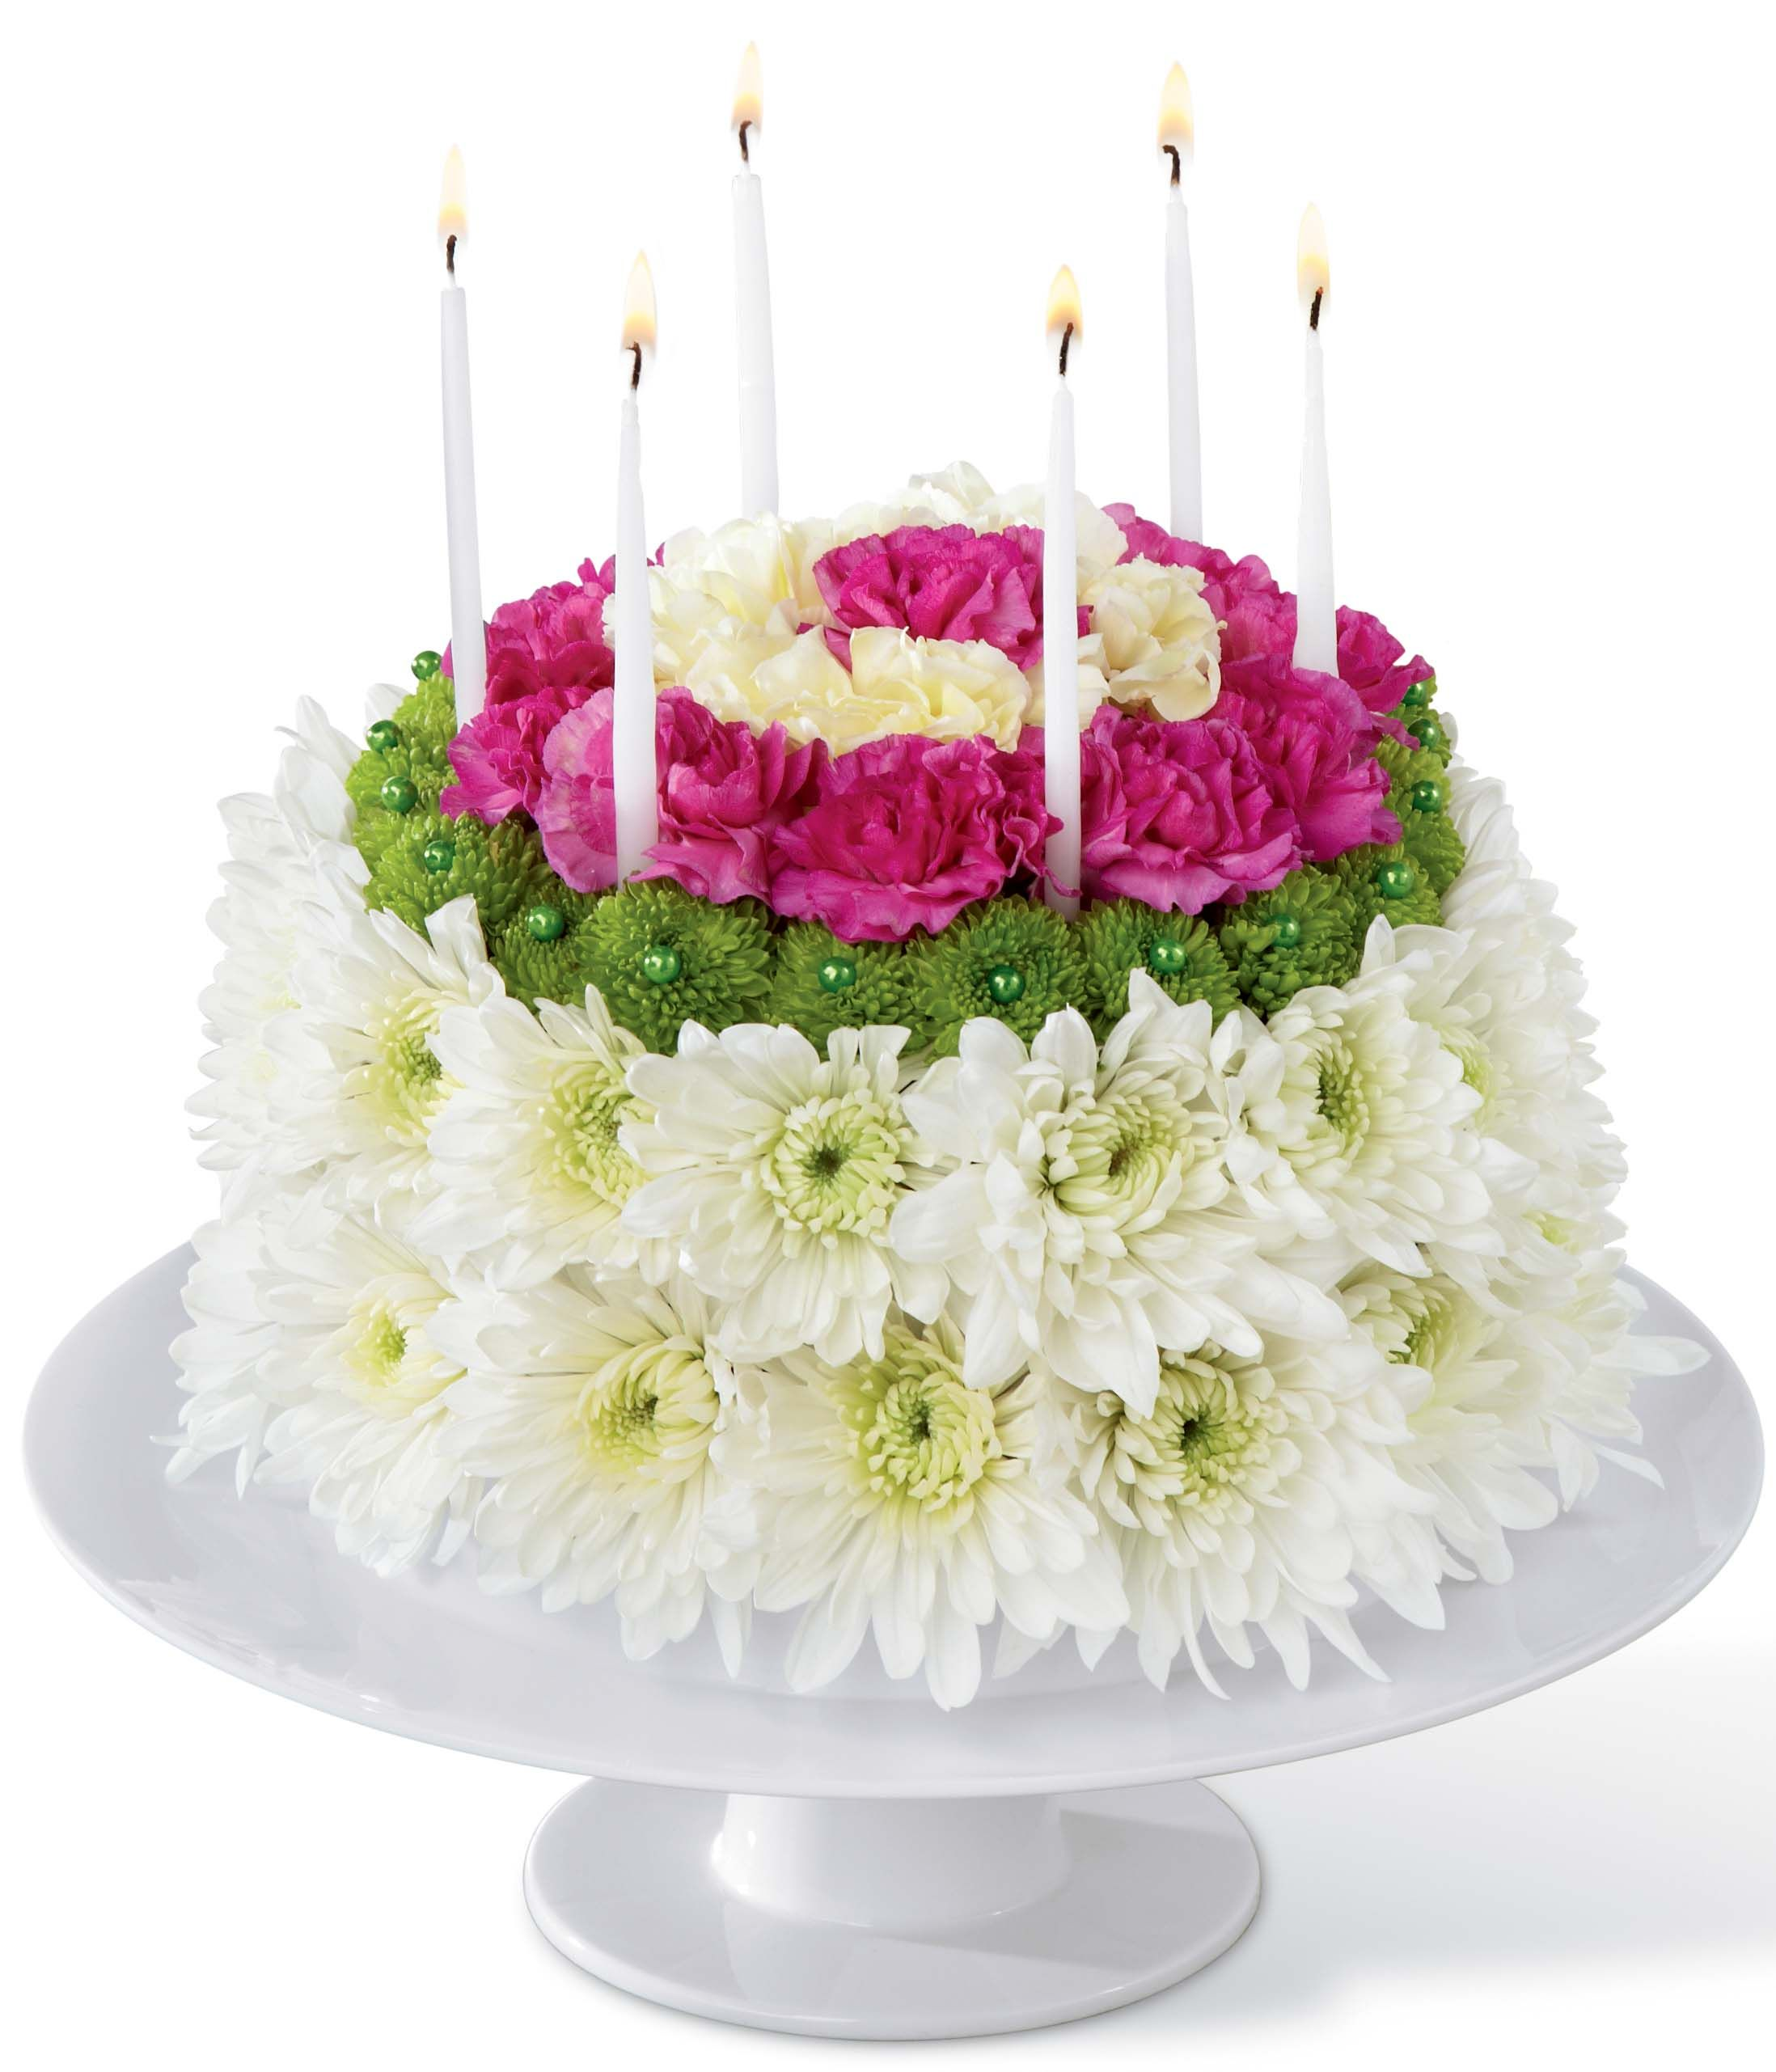 Top 25 Most Beautiful Smash Cakes Happy birthday flower